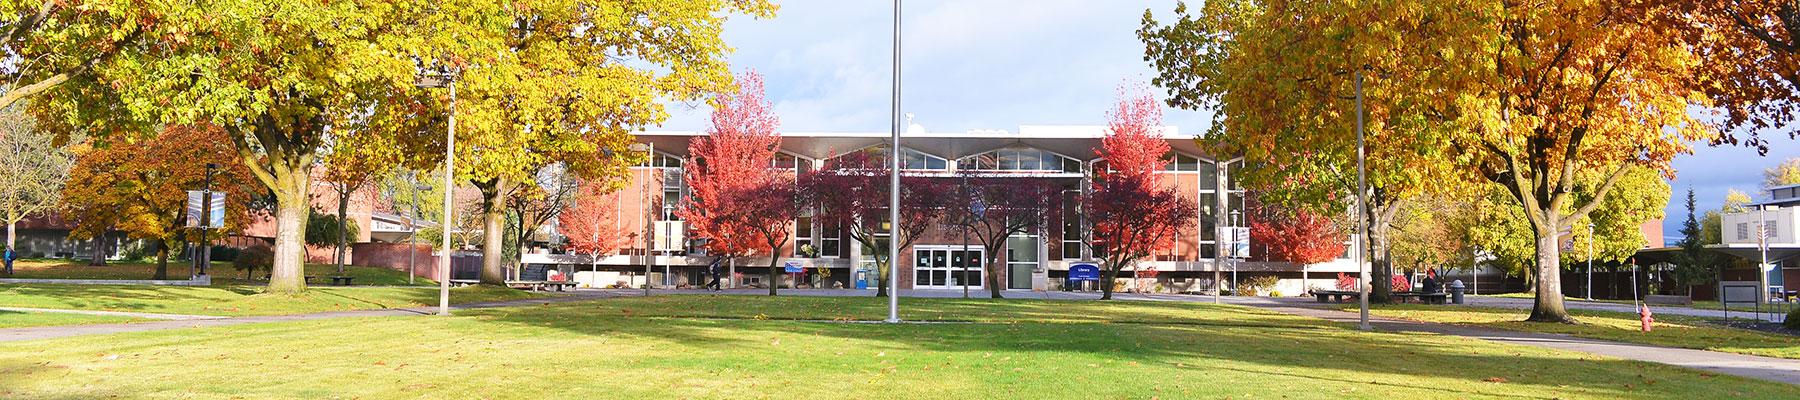 Fall scene on SFCC campus.